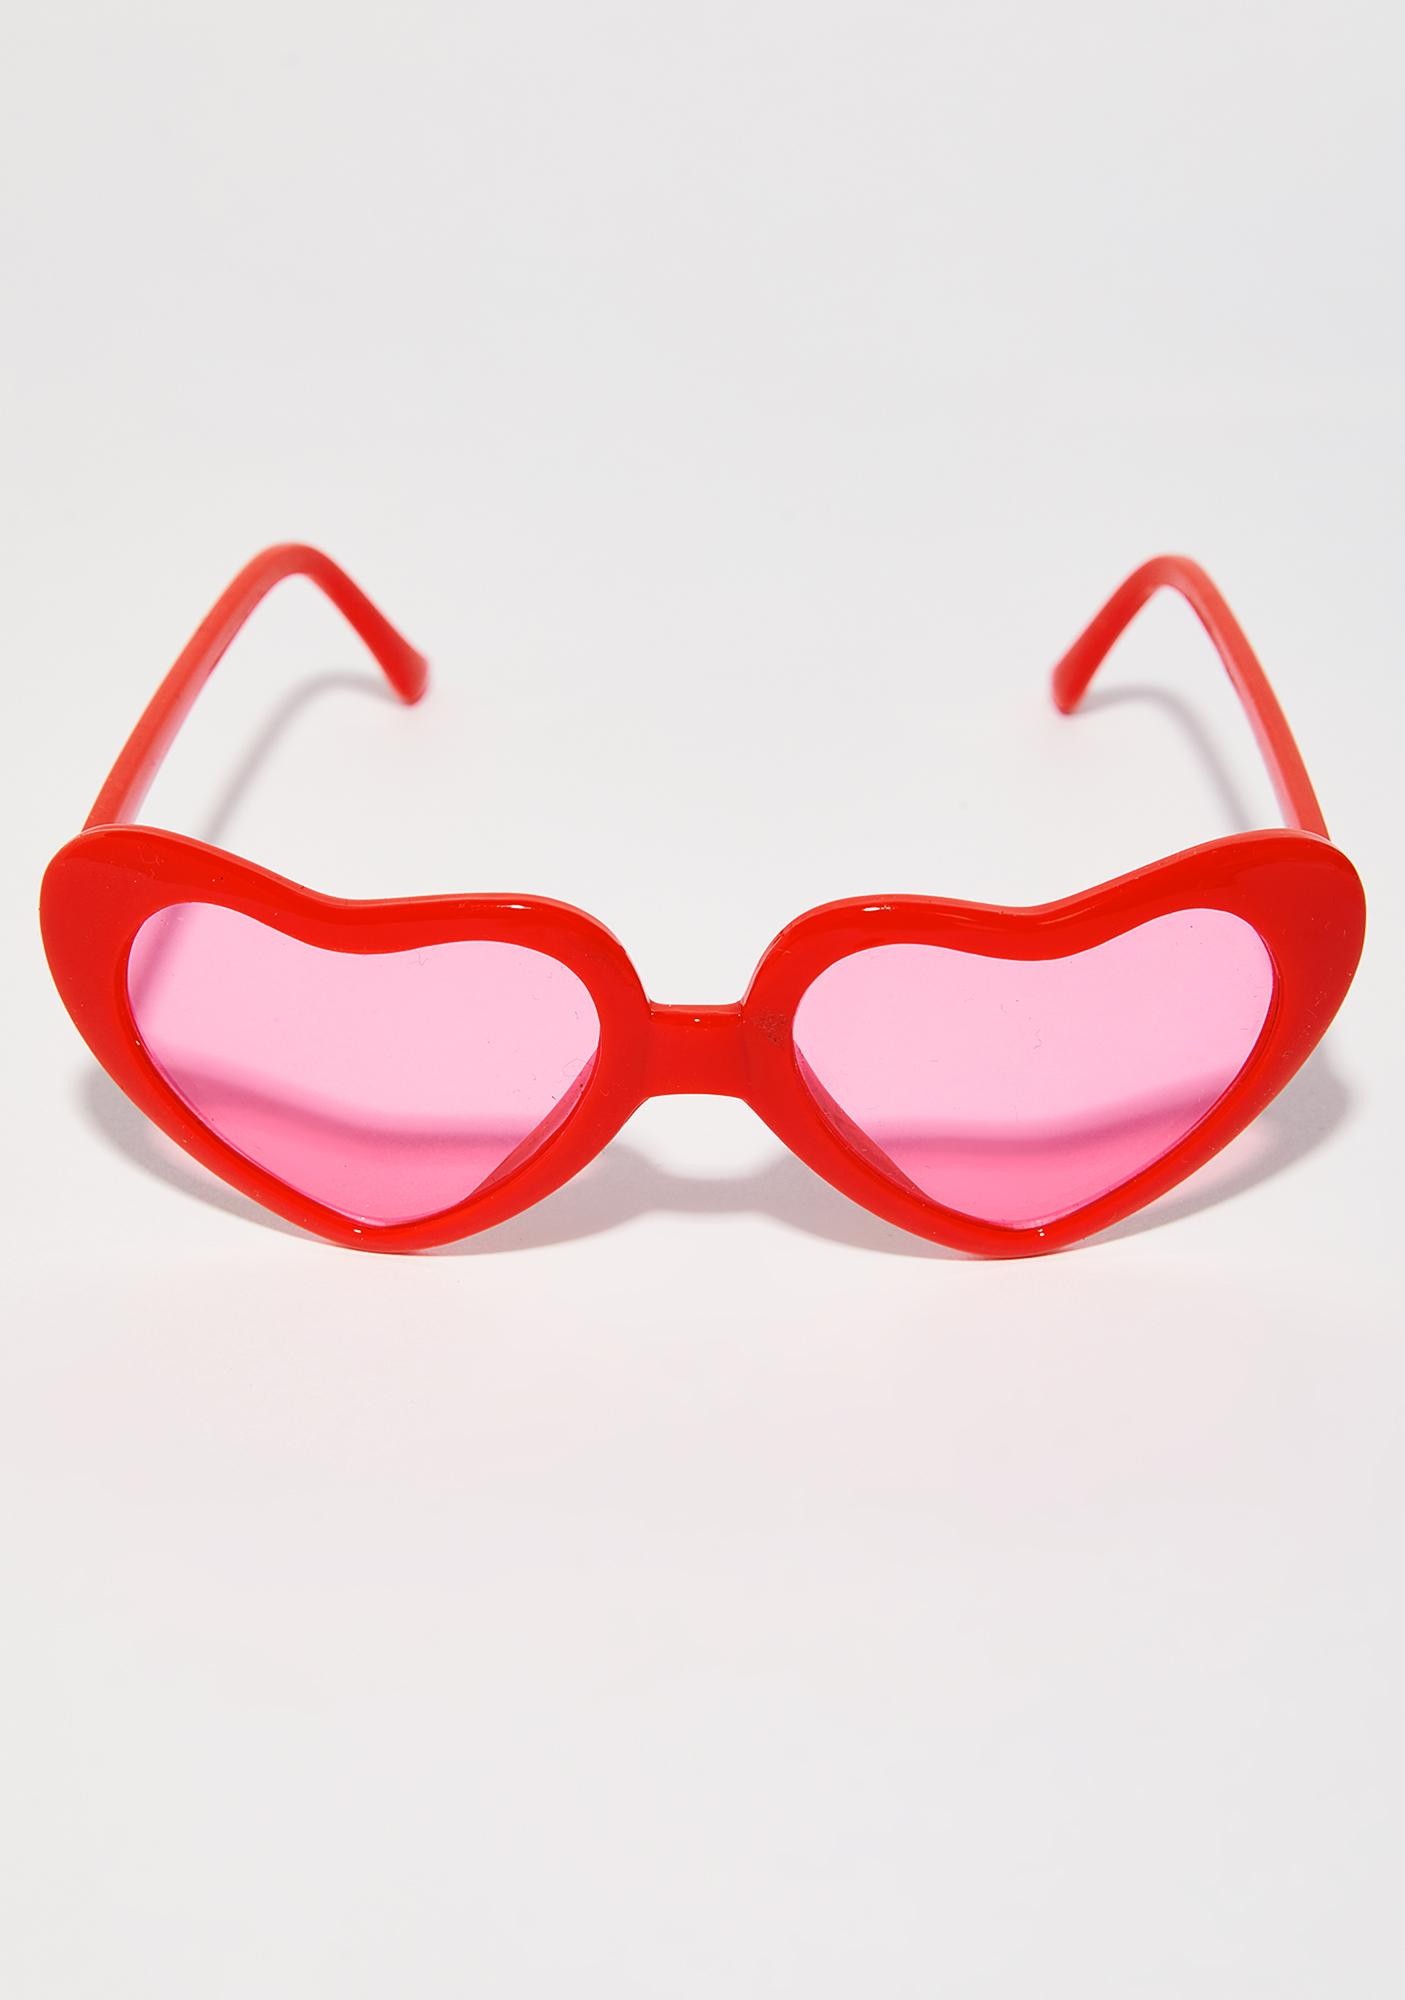 ea838aa575 ... Spread The Love Heart Sunglasses ...